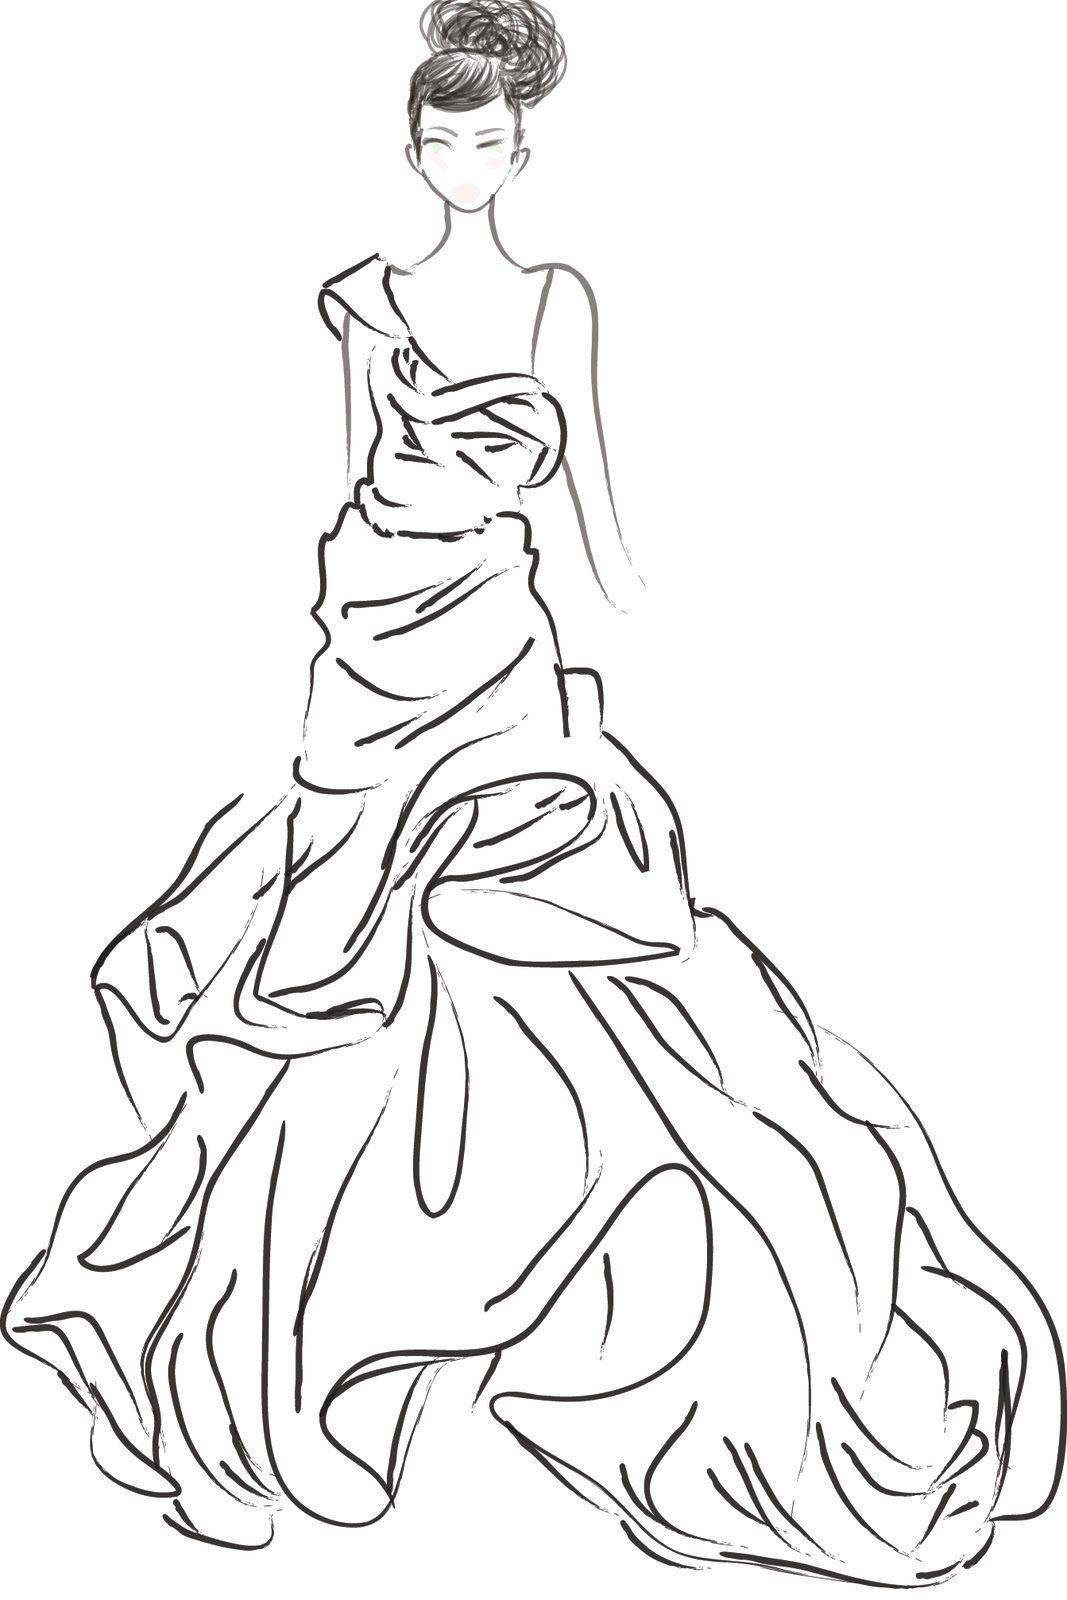 Free Printable Fashion Clothes Coloring Pages Dibujos De Moda Bocetos De Moda Ilustracion De Boda